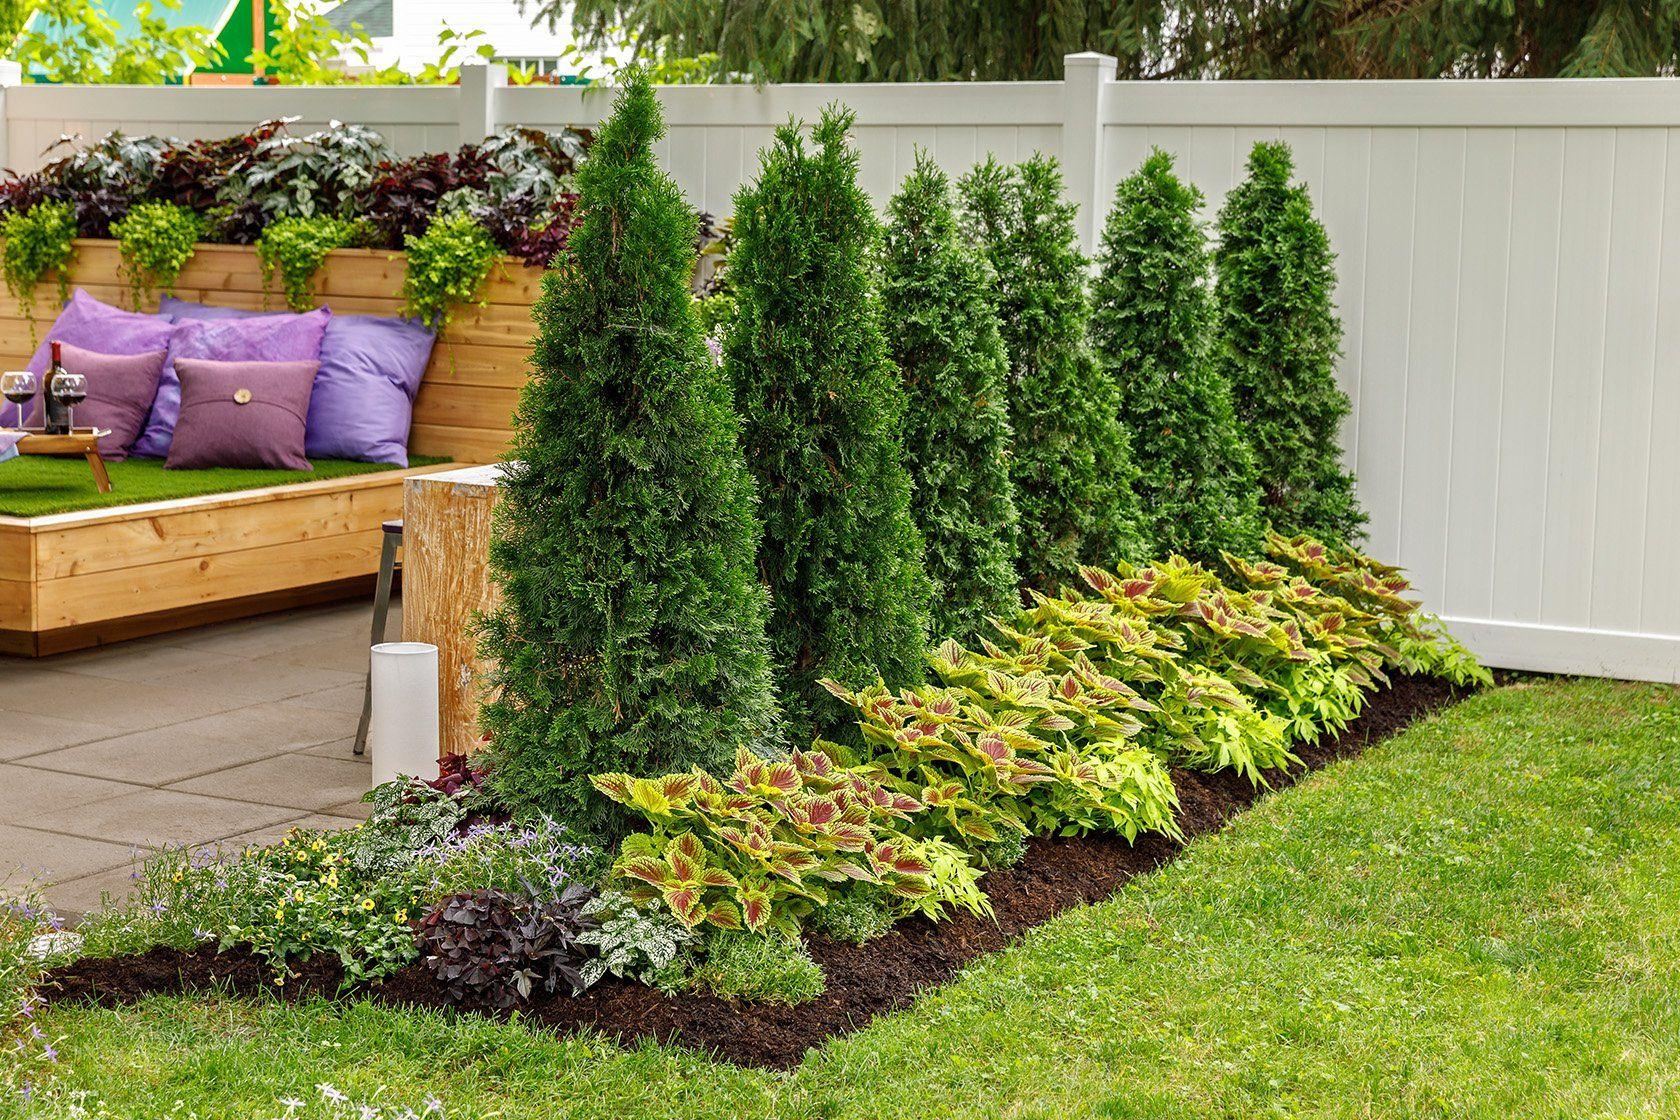 North Pole Arborvitae Thuja Privacy Landscaping Backyard Garden Design Backyard Landscaping Designs Backyard landscaping ideas with arborvitae